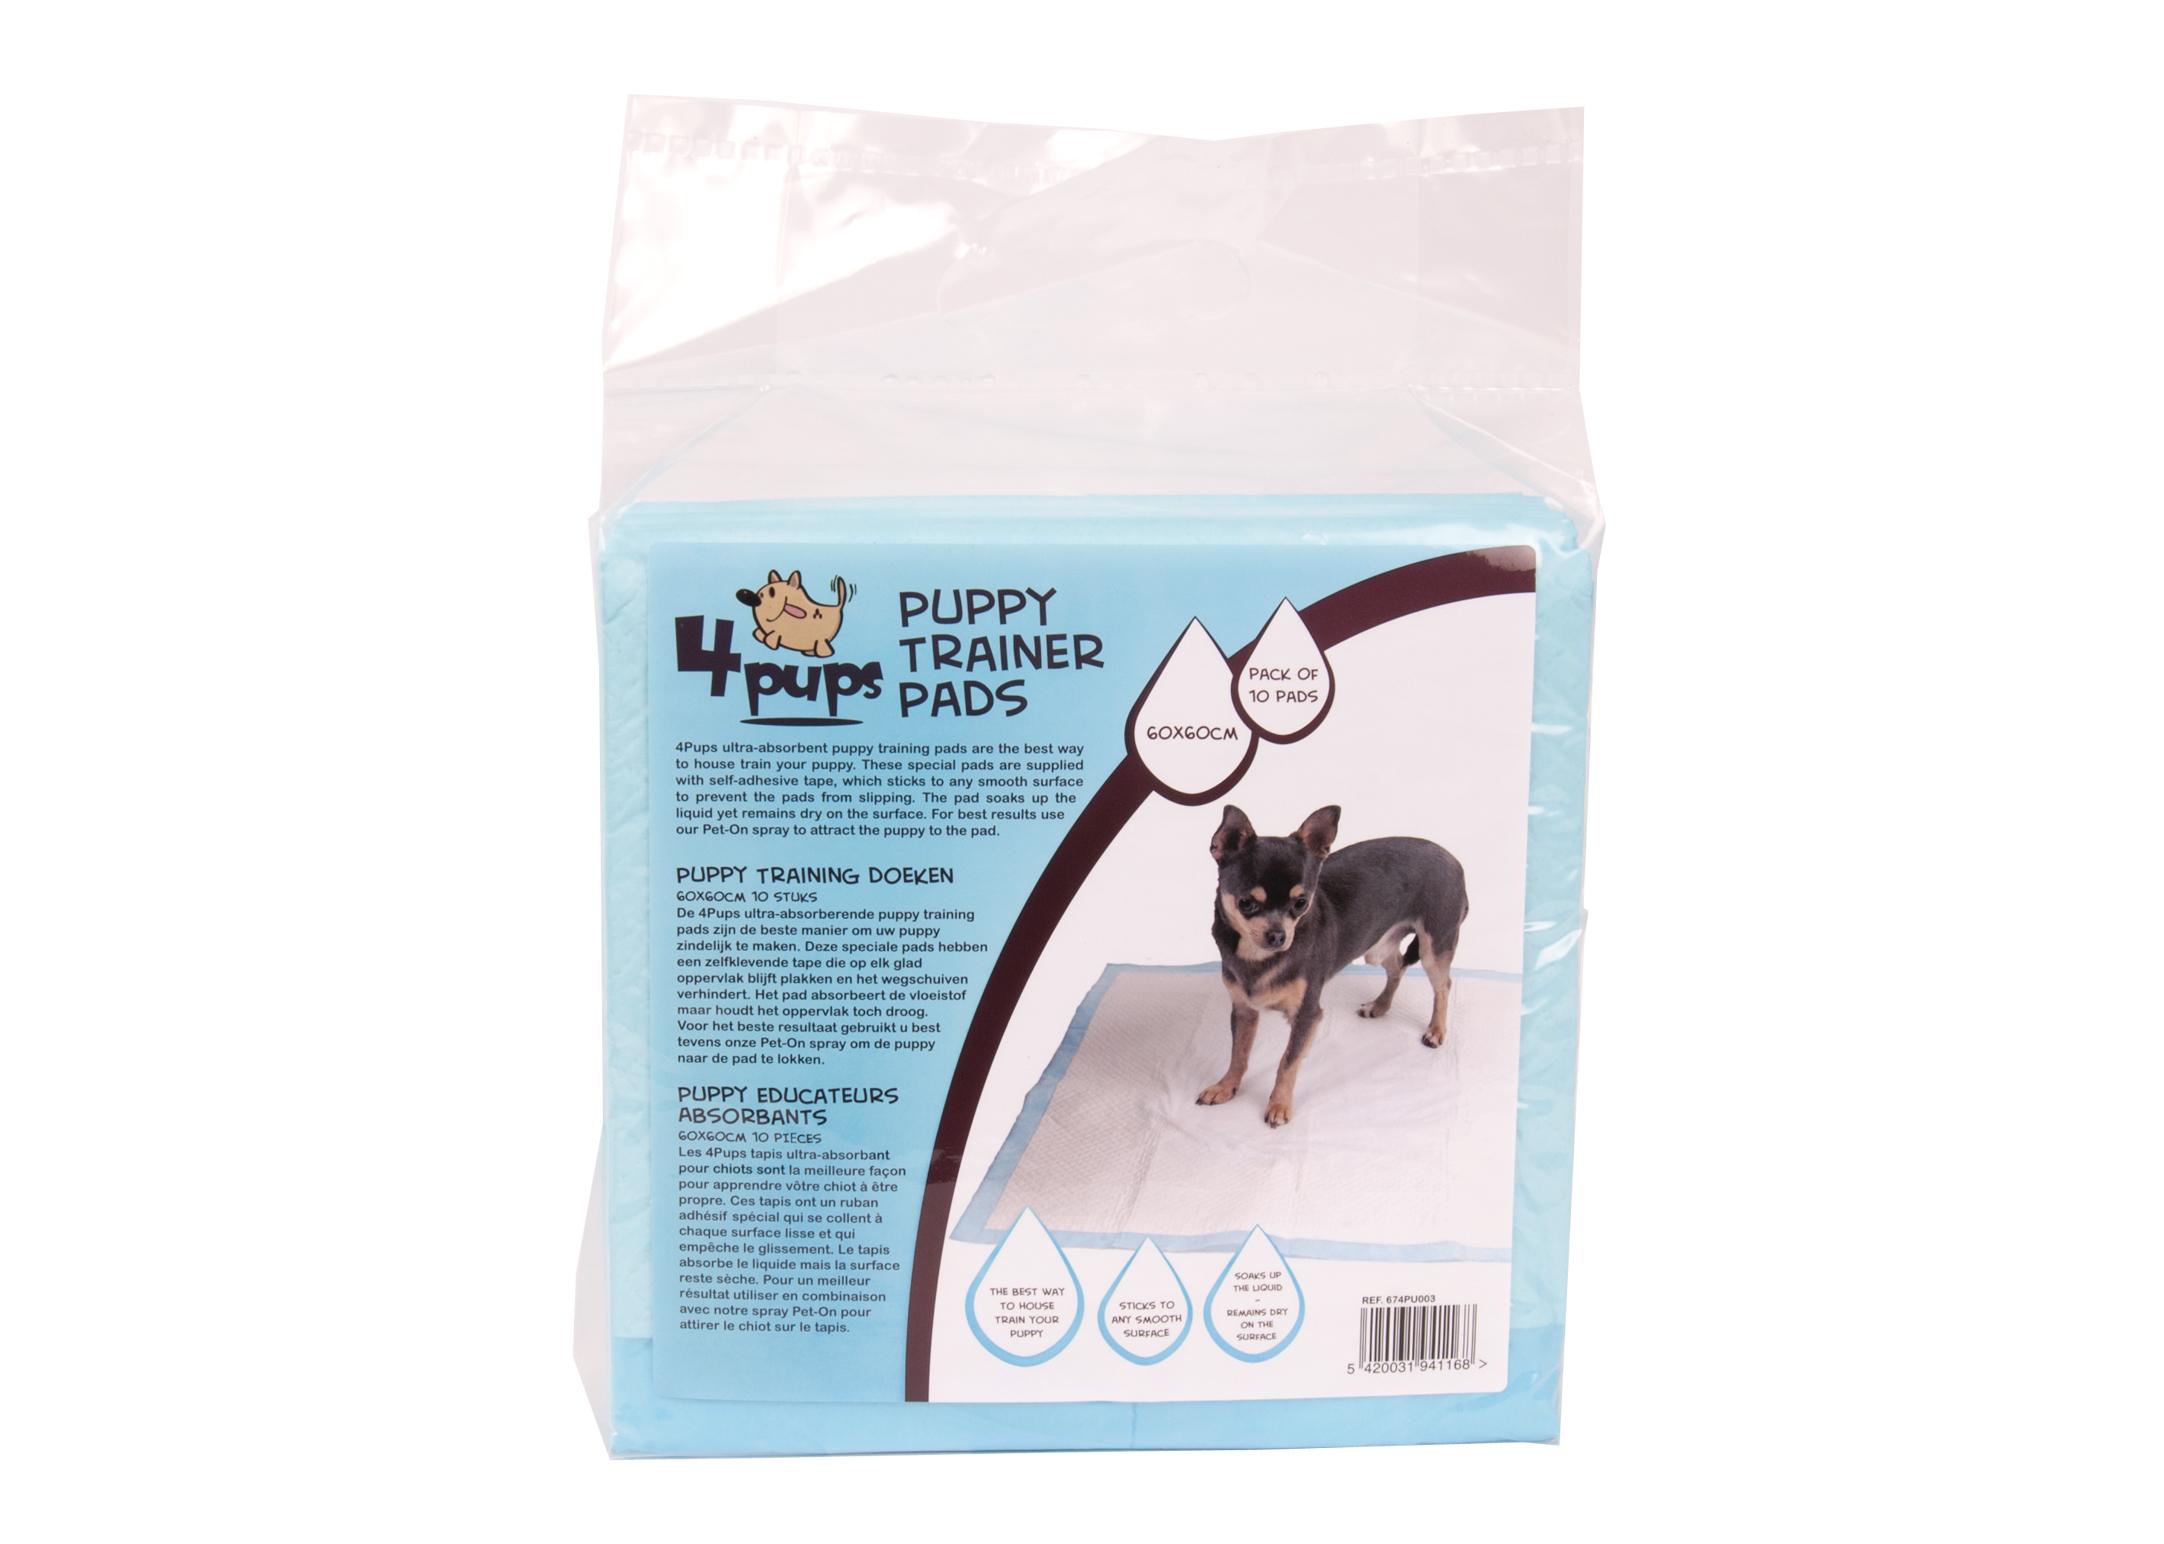 4Pups Puppy Trainer Pads 60x60cm 10pcs House-Training Aid